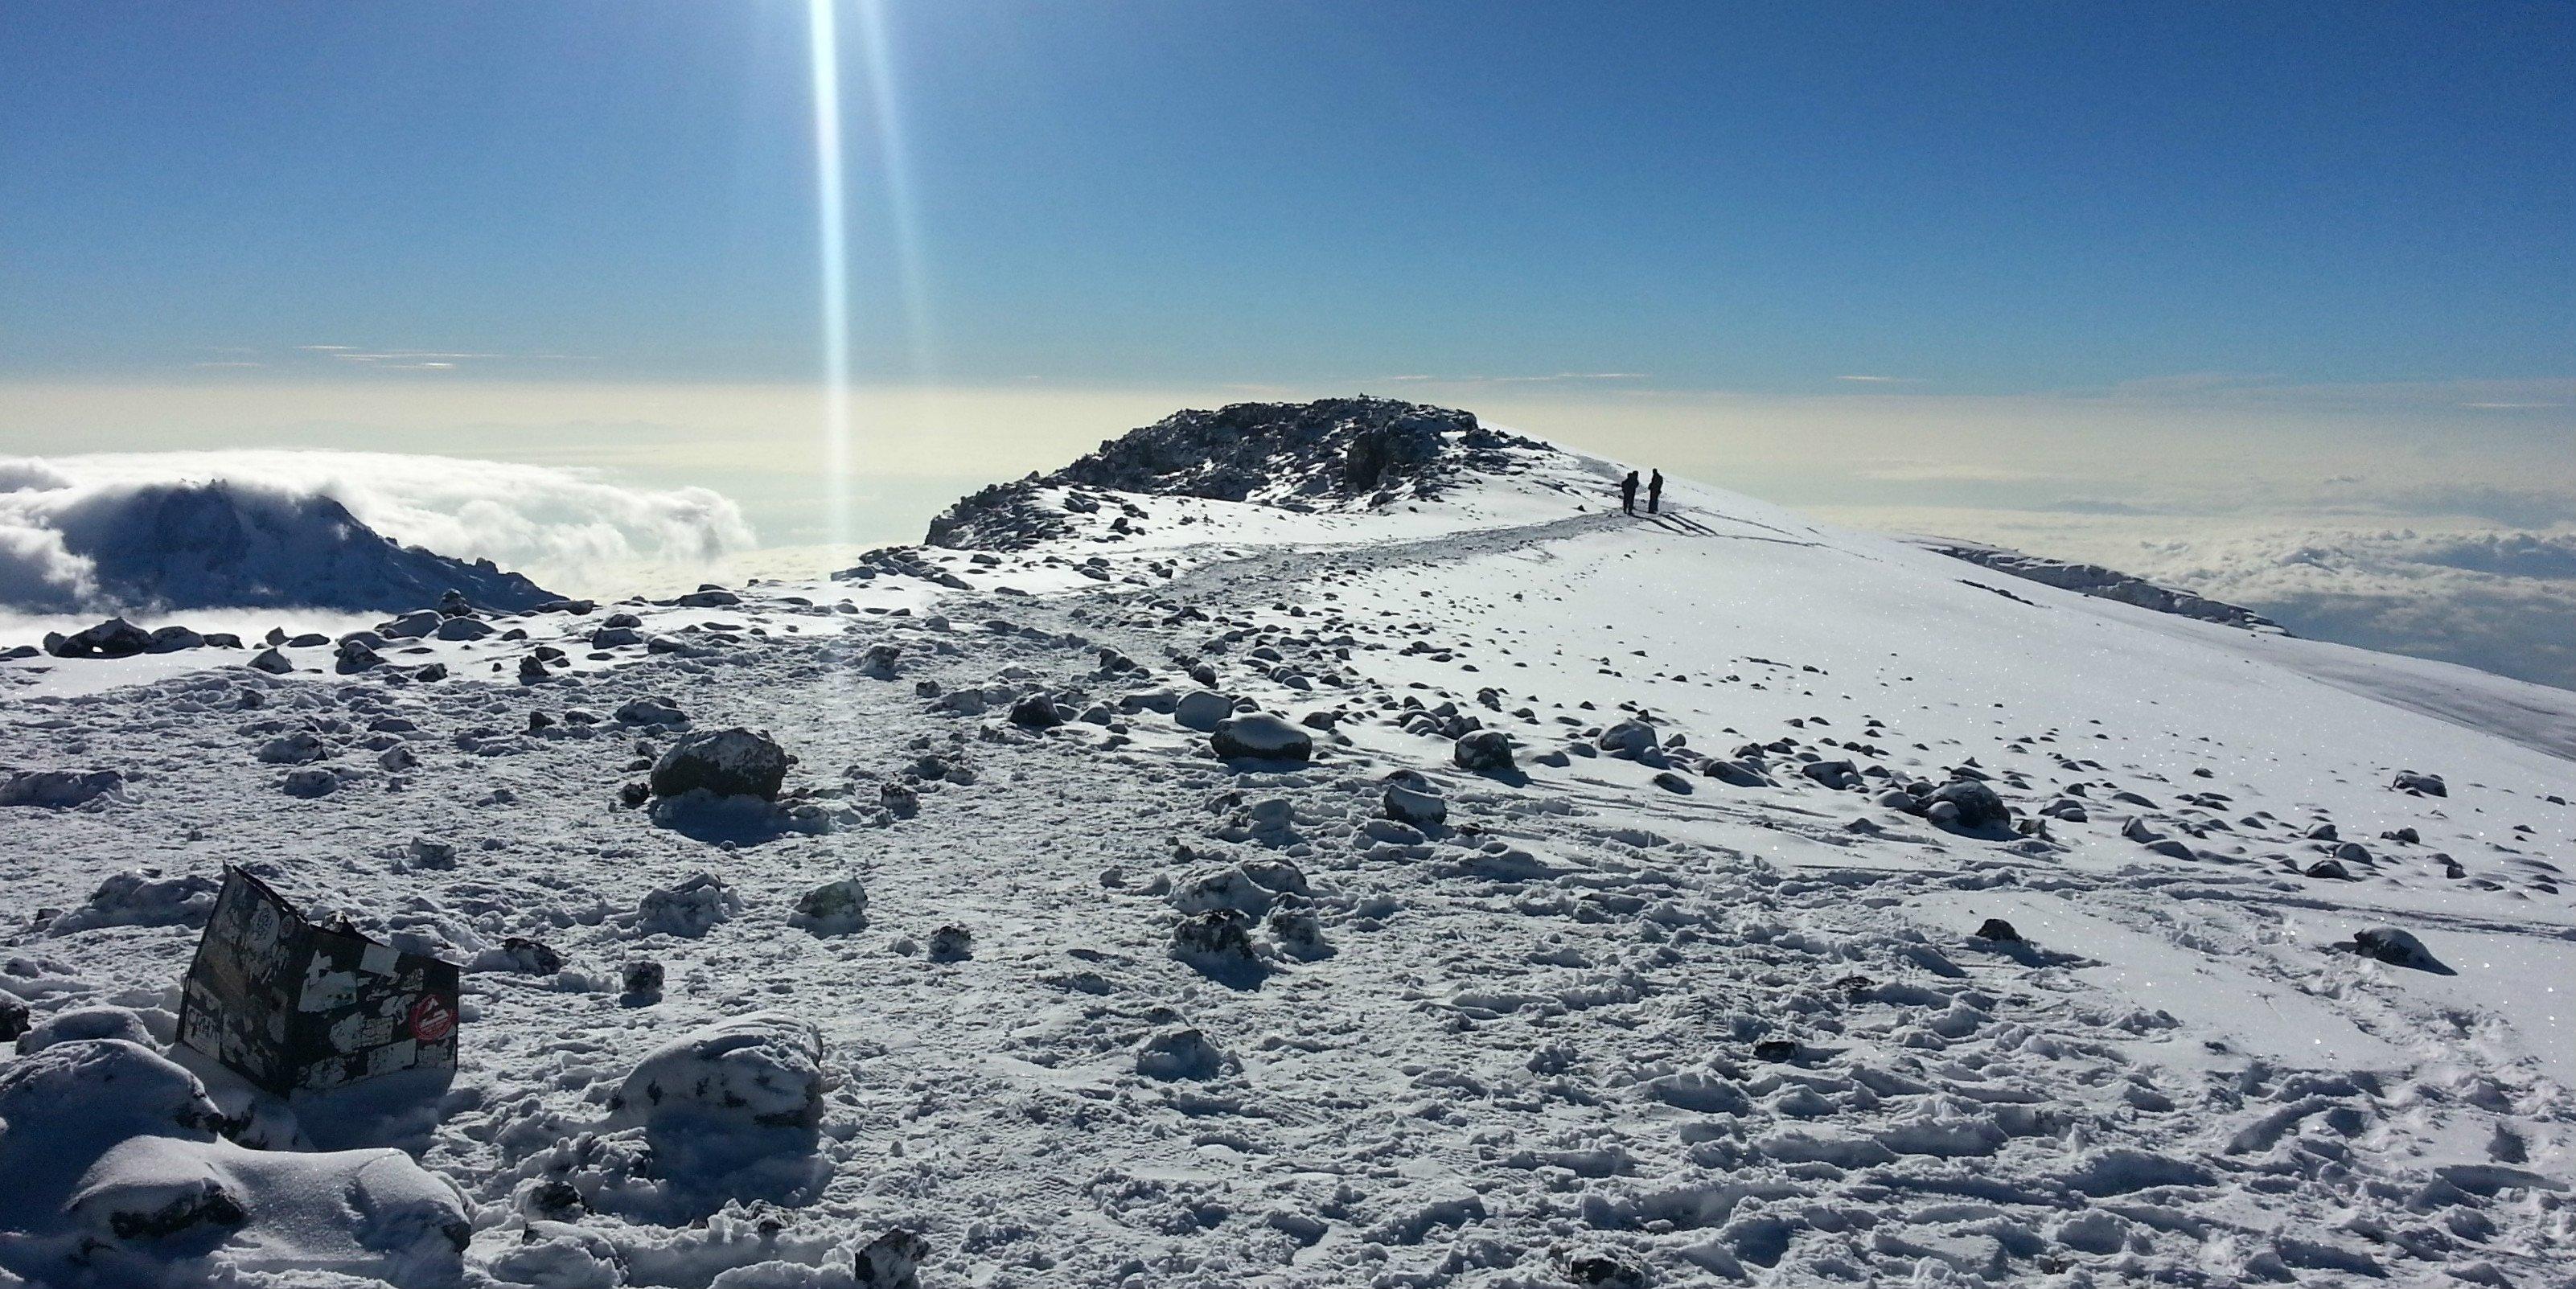 mount kilimanjaro facts